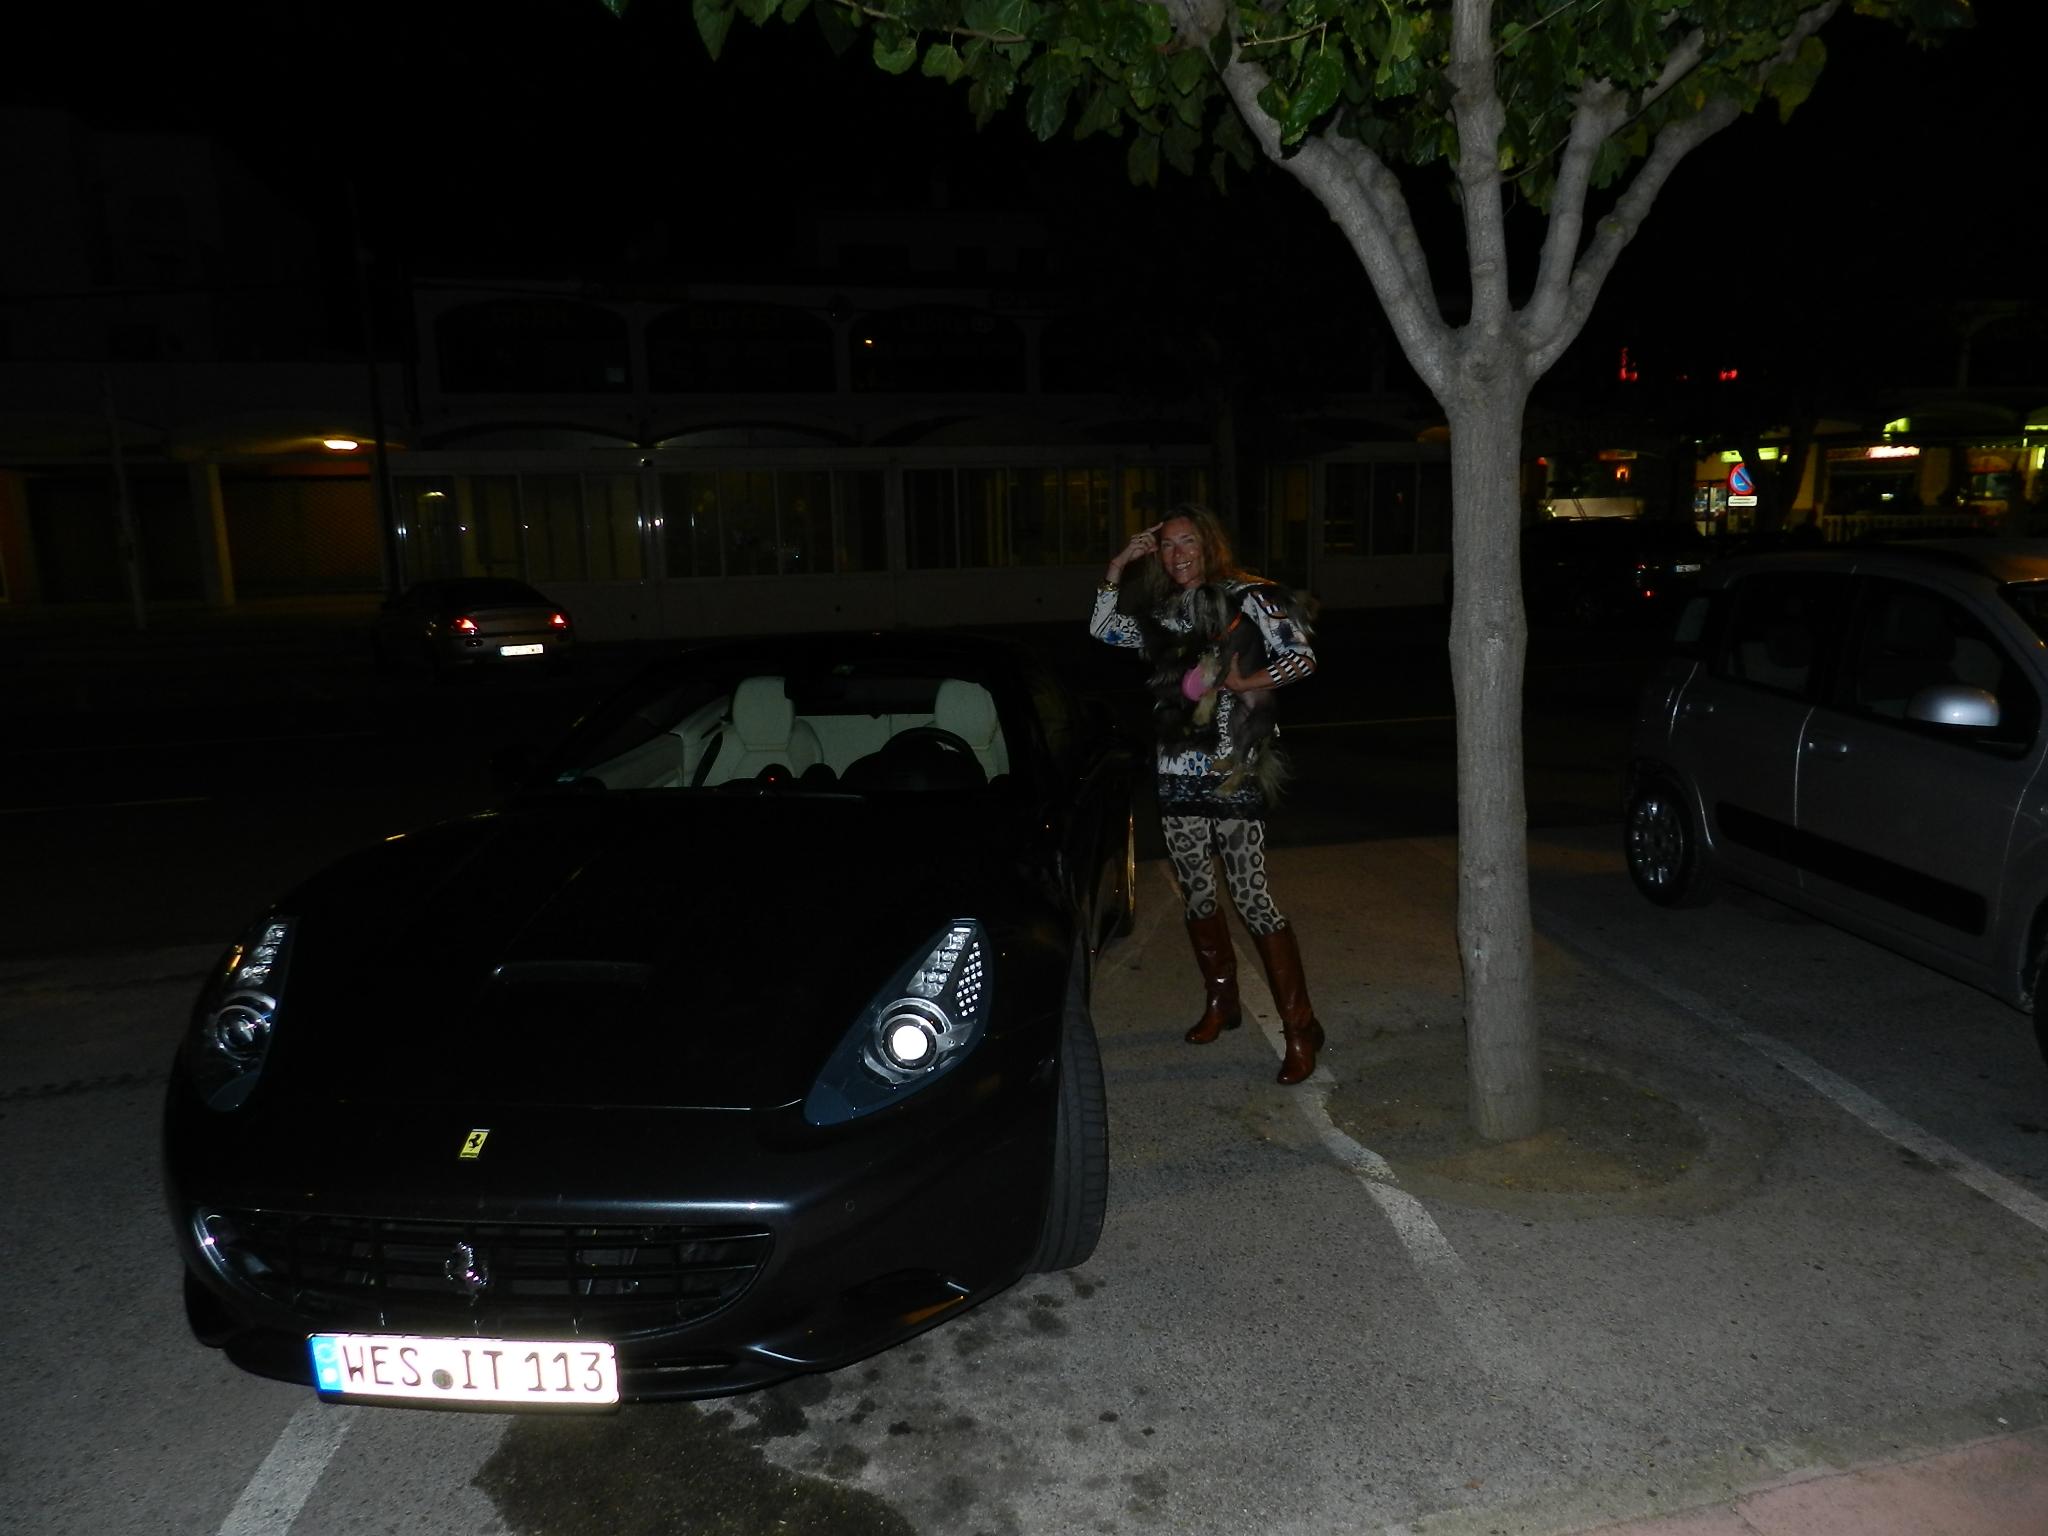 В Испании я предпочитаю Некитайские автомобили